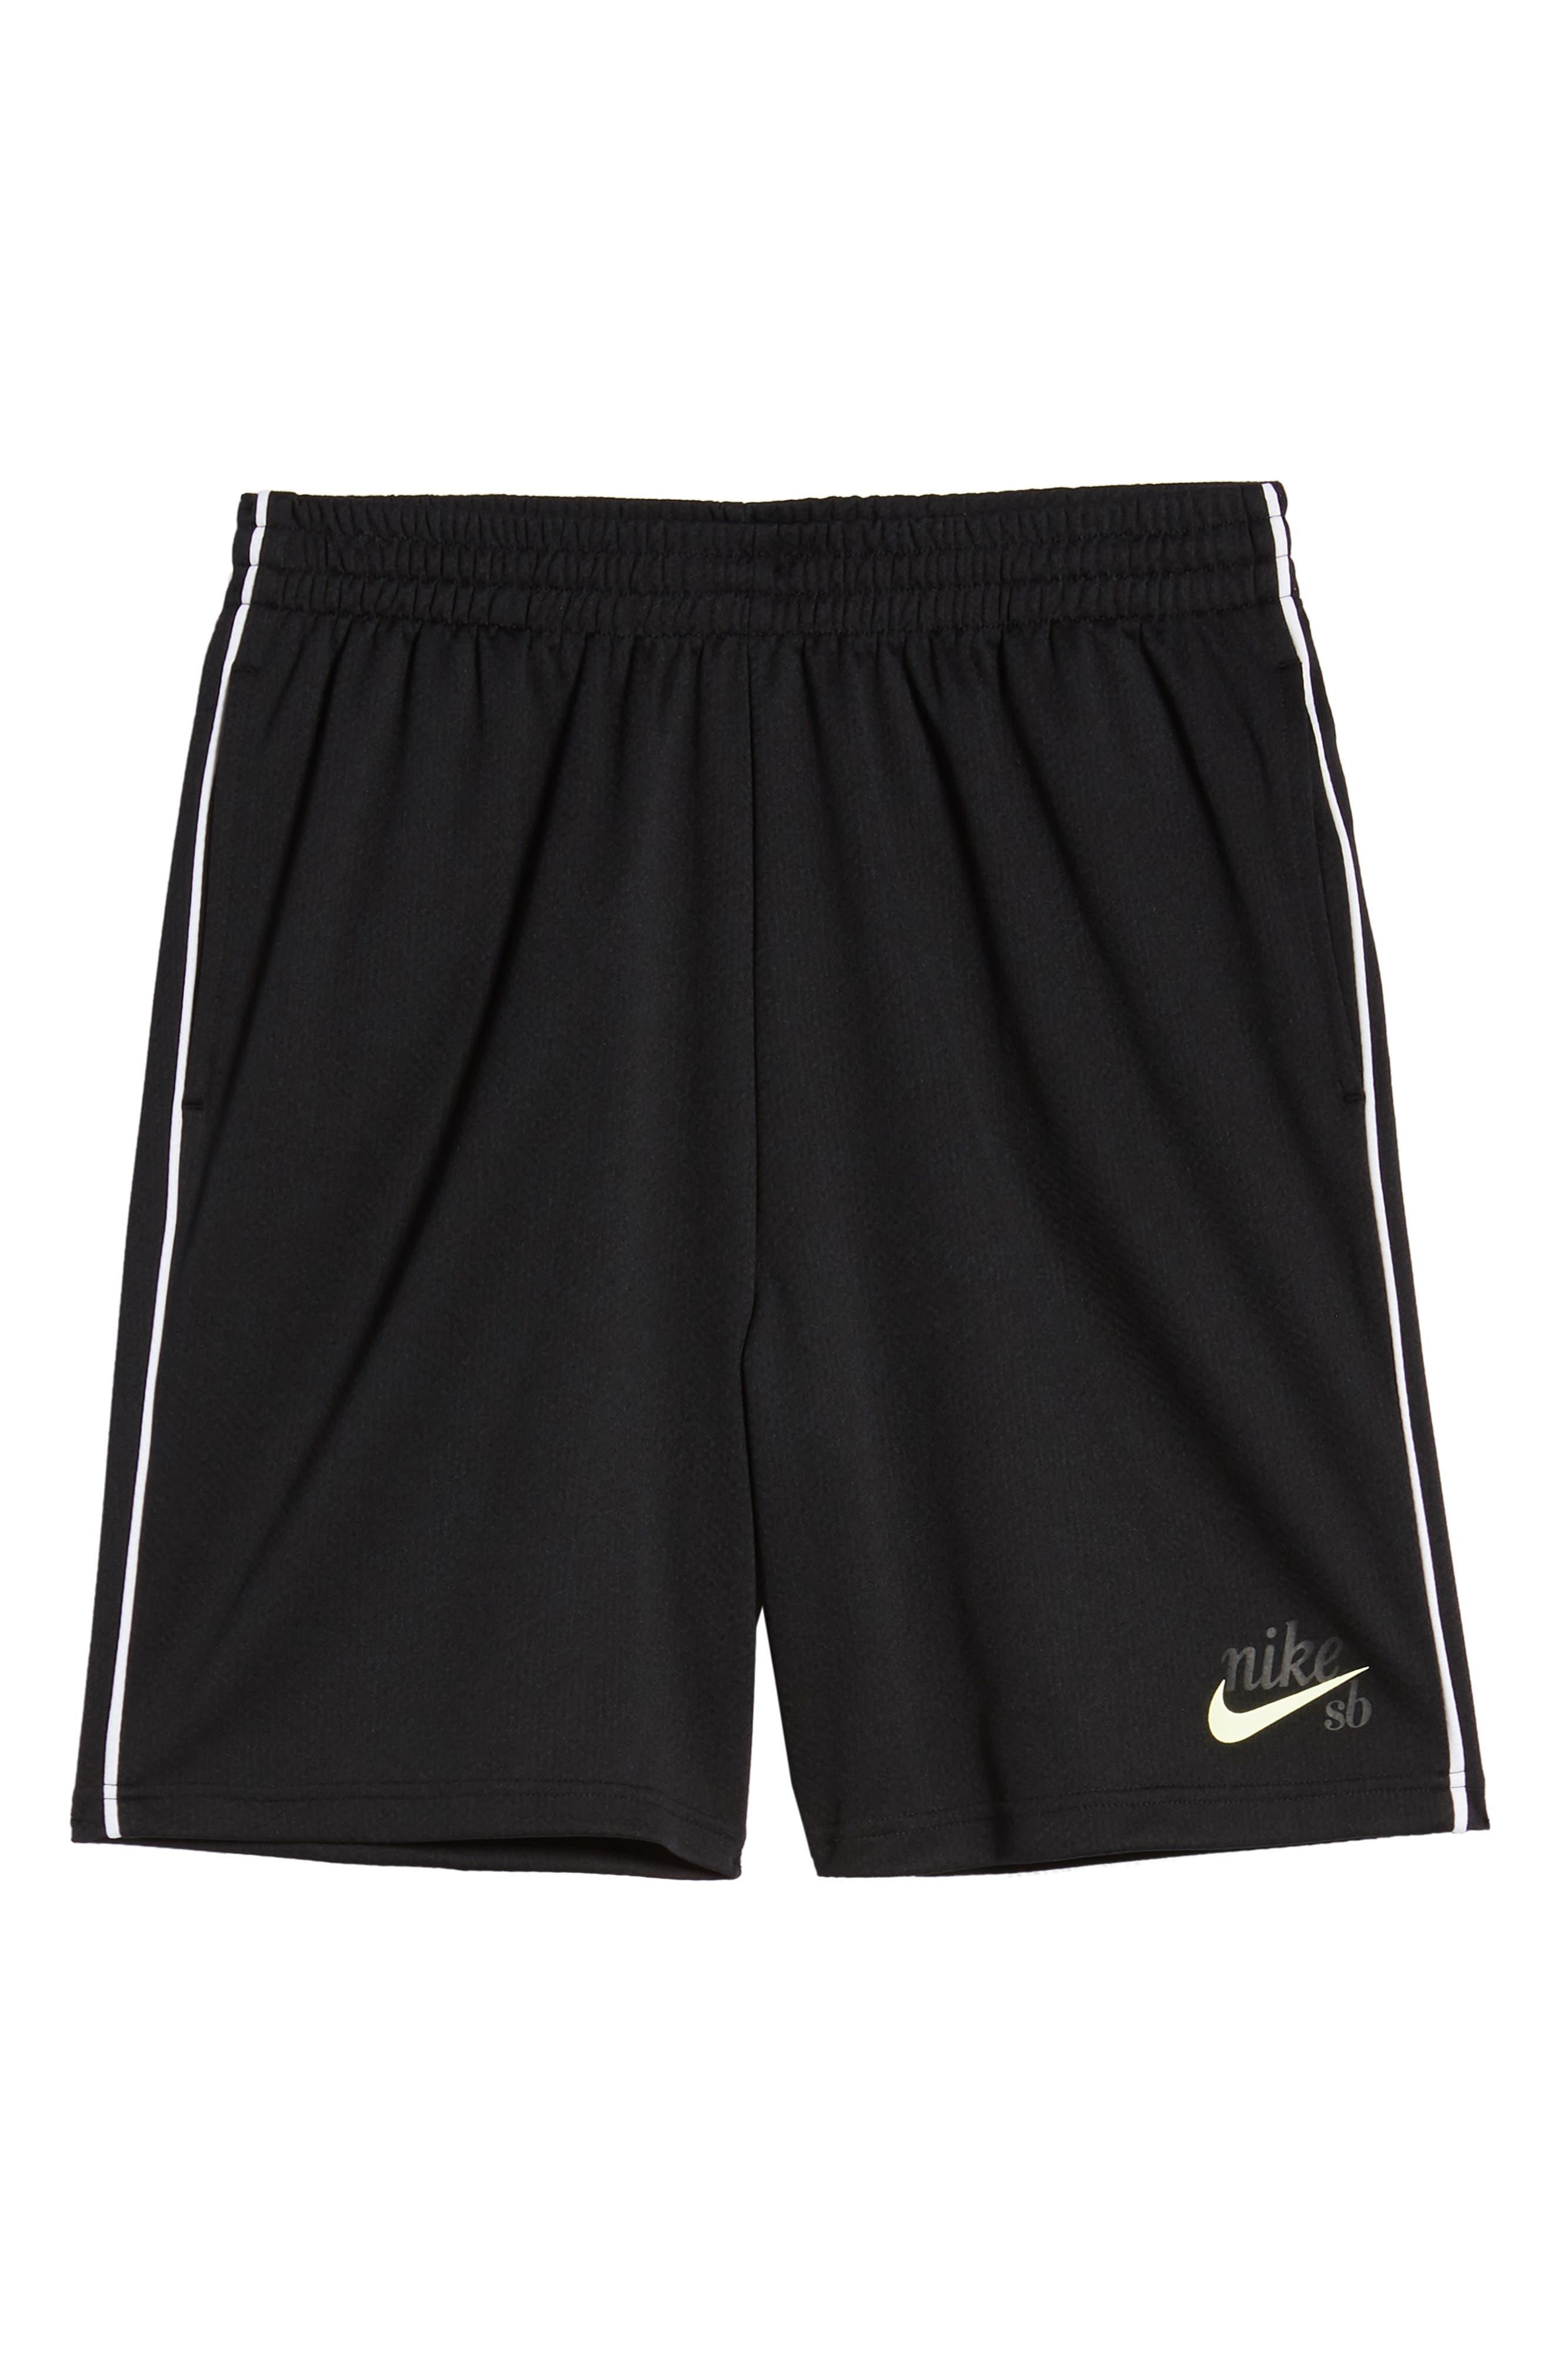 NIKE SB, Dry Sunday Morning Shorts, Alternate thumbnail 7, color, BLACK/ WHITE/ BARELY VOLT